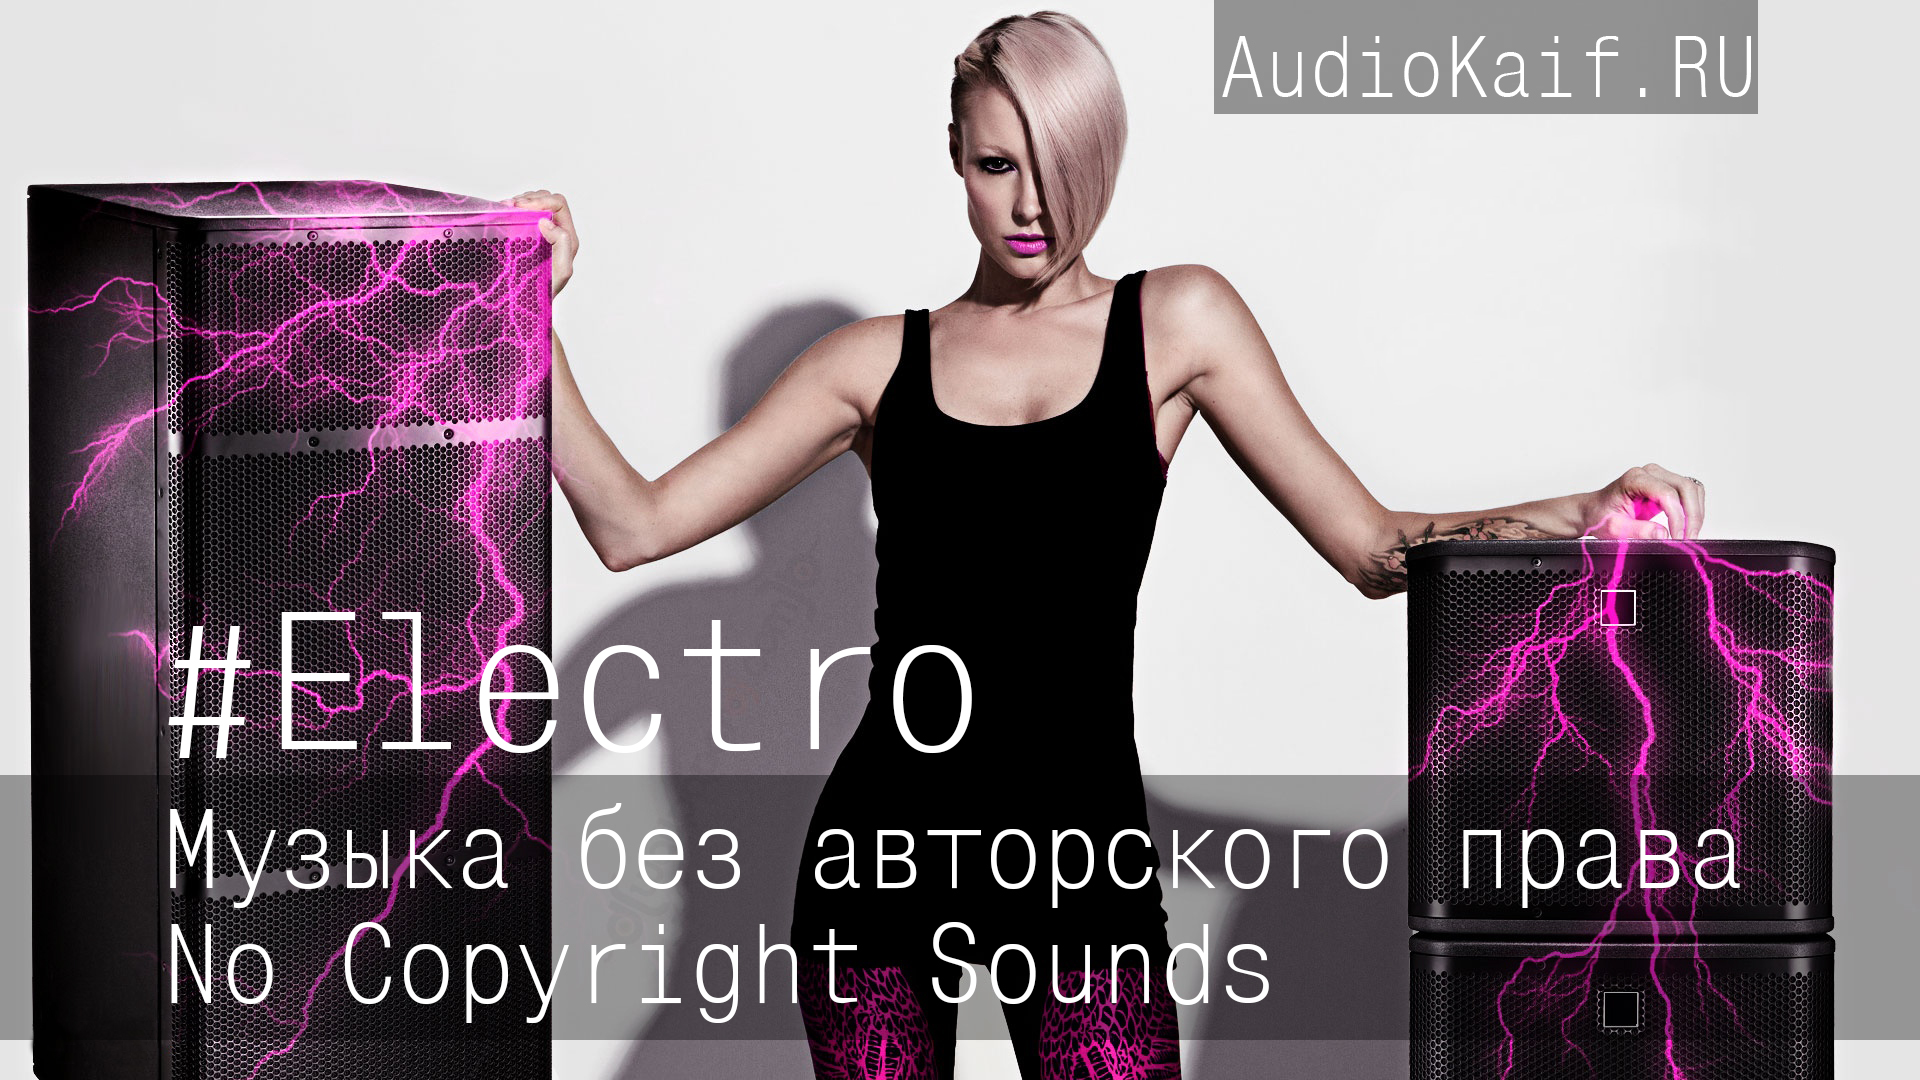 Музыка без авторского права / Four Eyes / Electro